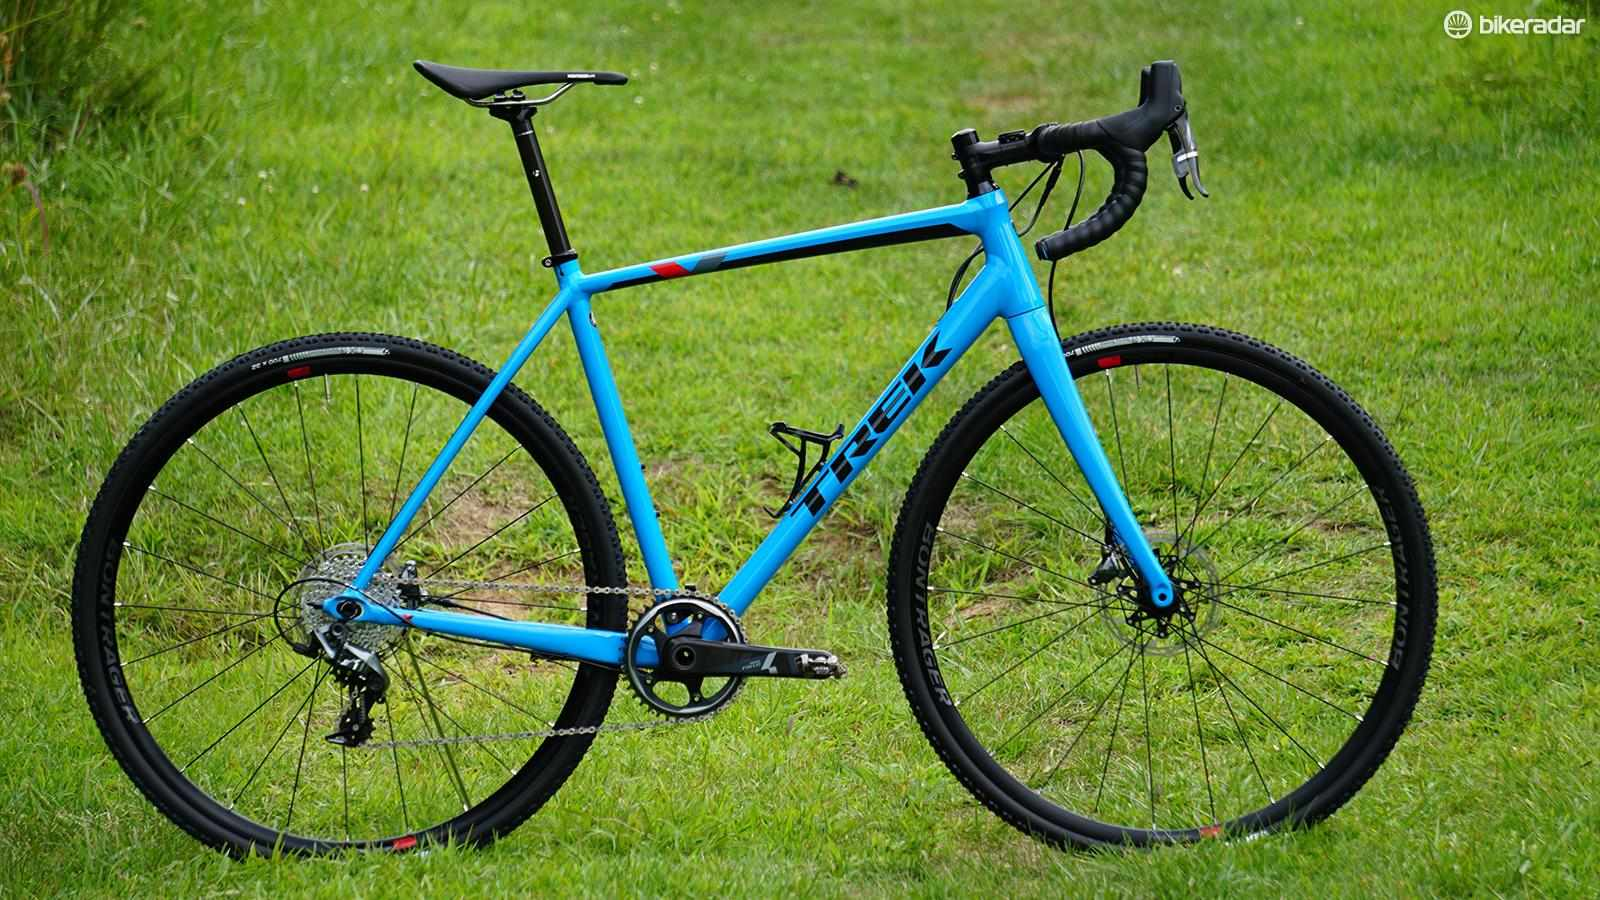 Trek Crockett 7 Disc cyclocross bike